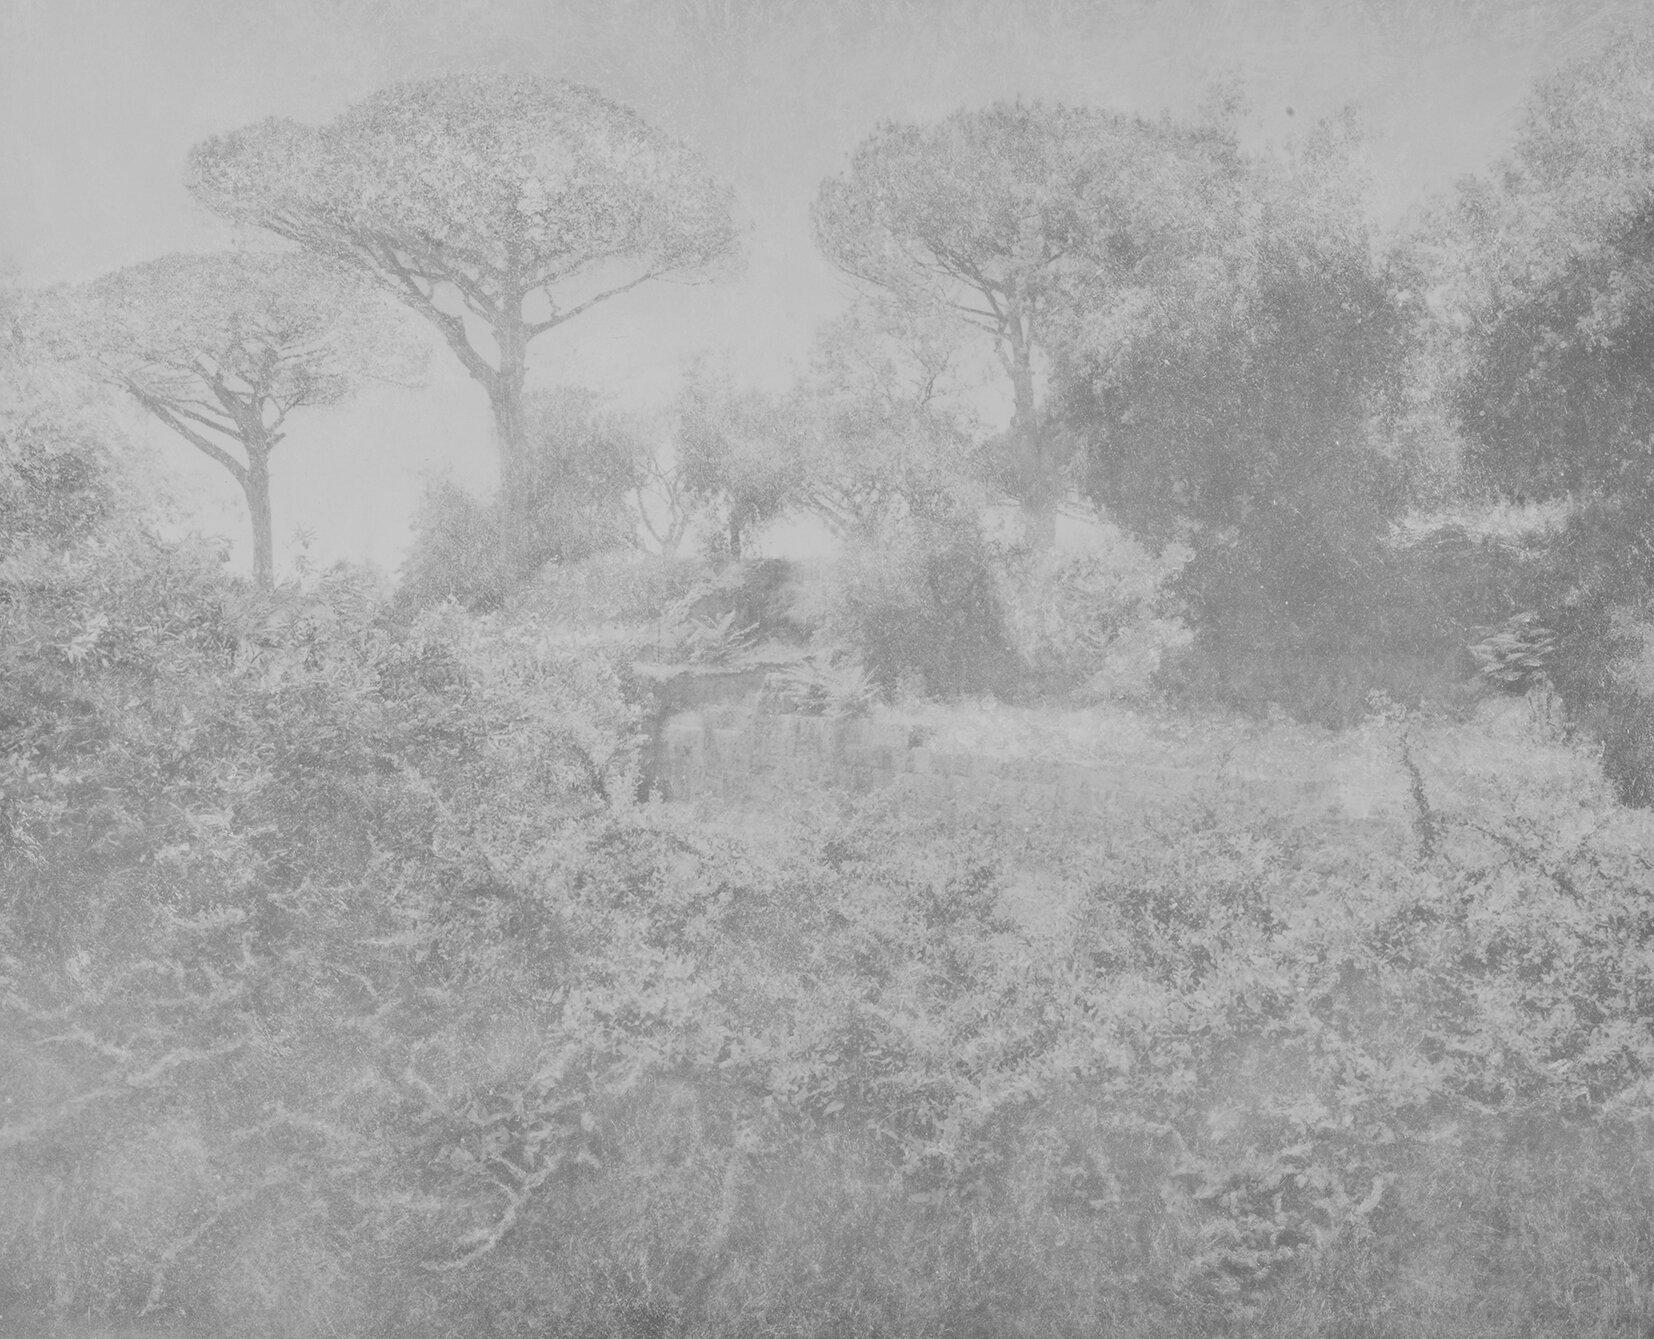 Pompeii_ForumBoarium_courtesyGalerieThierryBigaignon.jpg